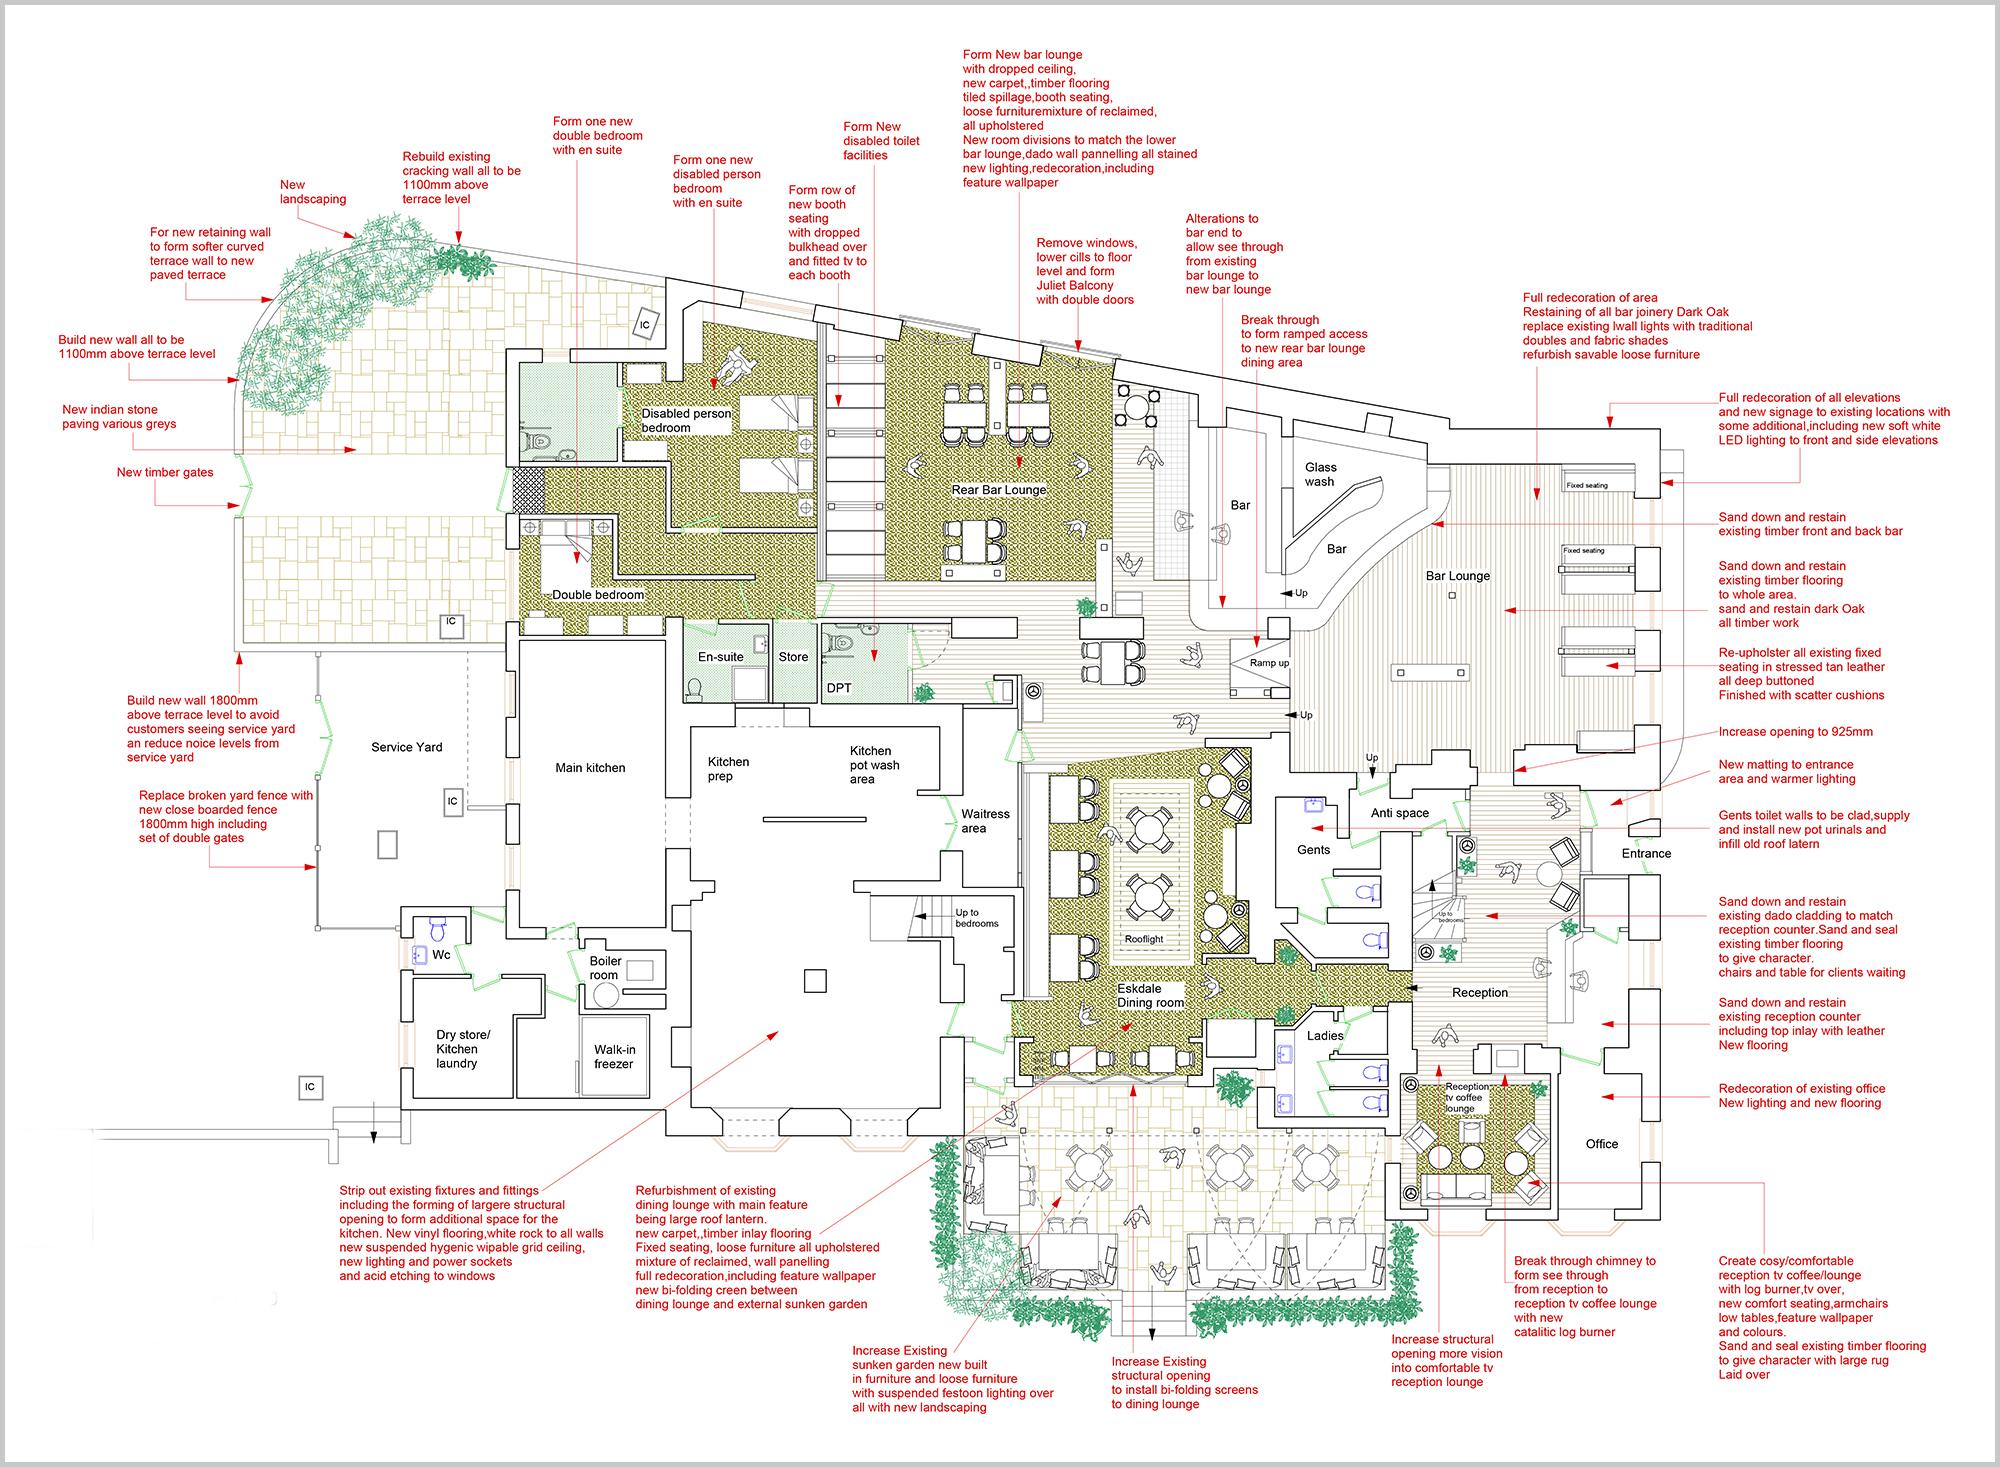 The Bridge Inn Ground Floor Plan